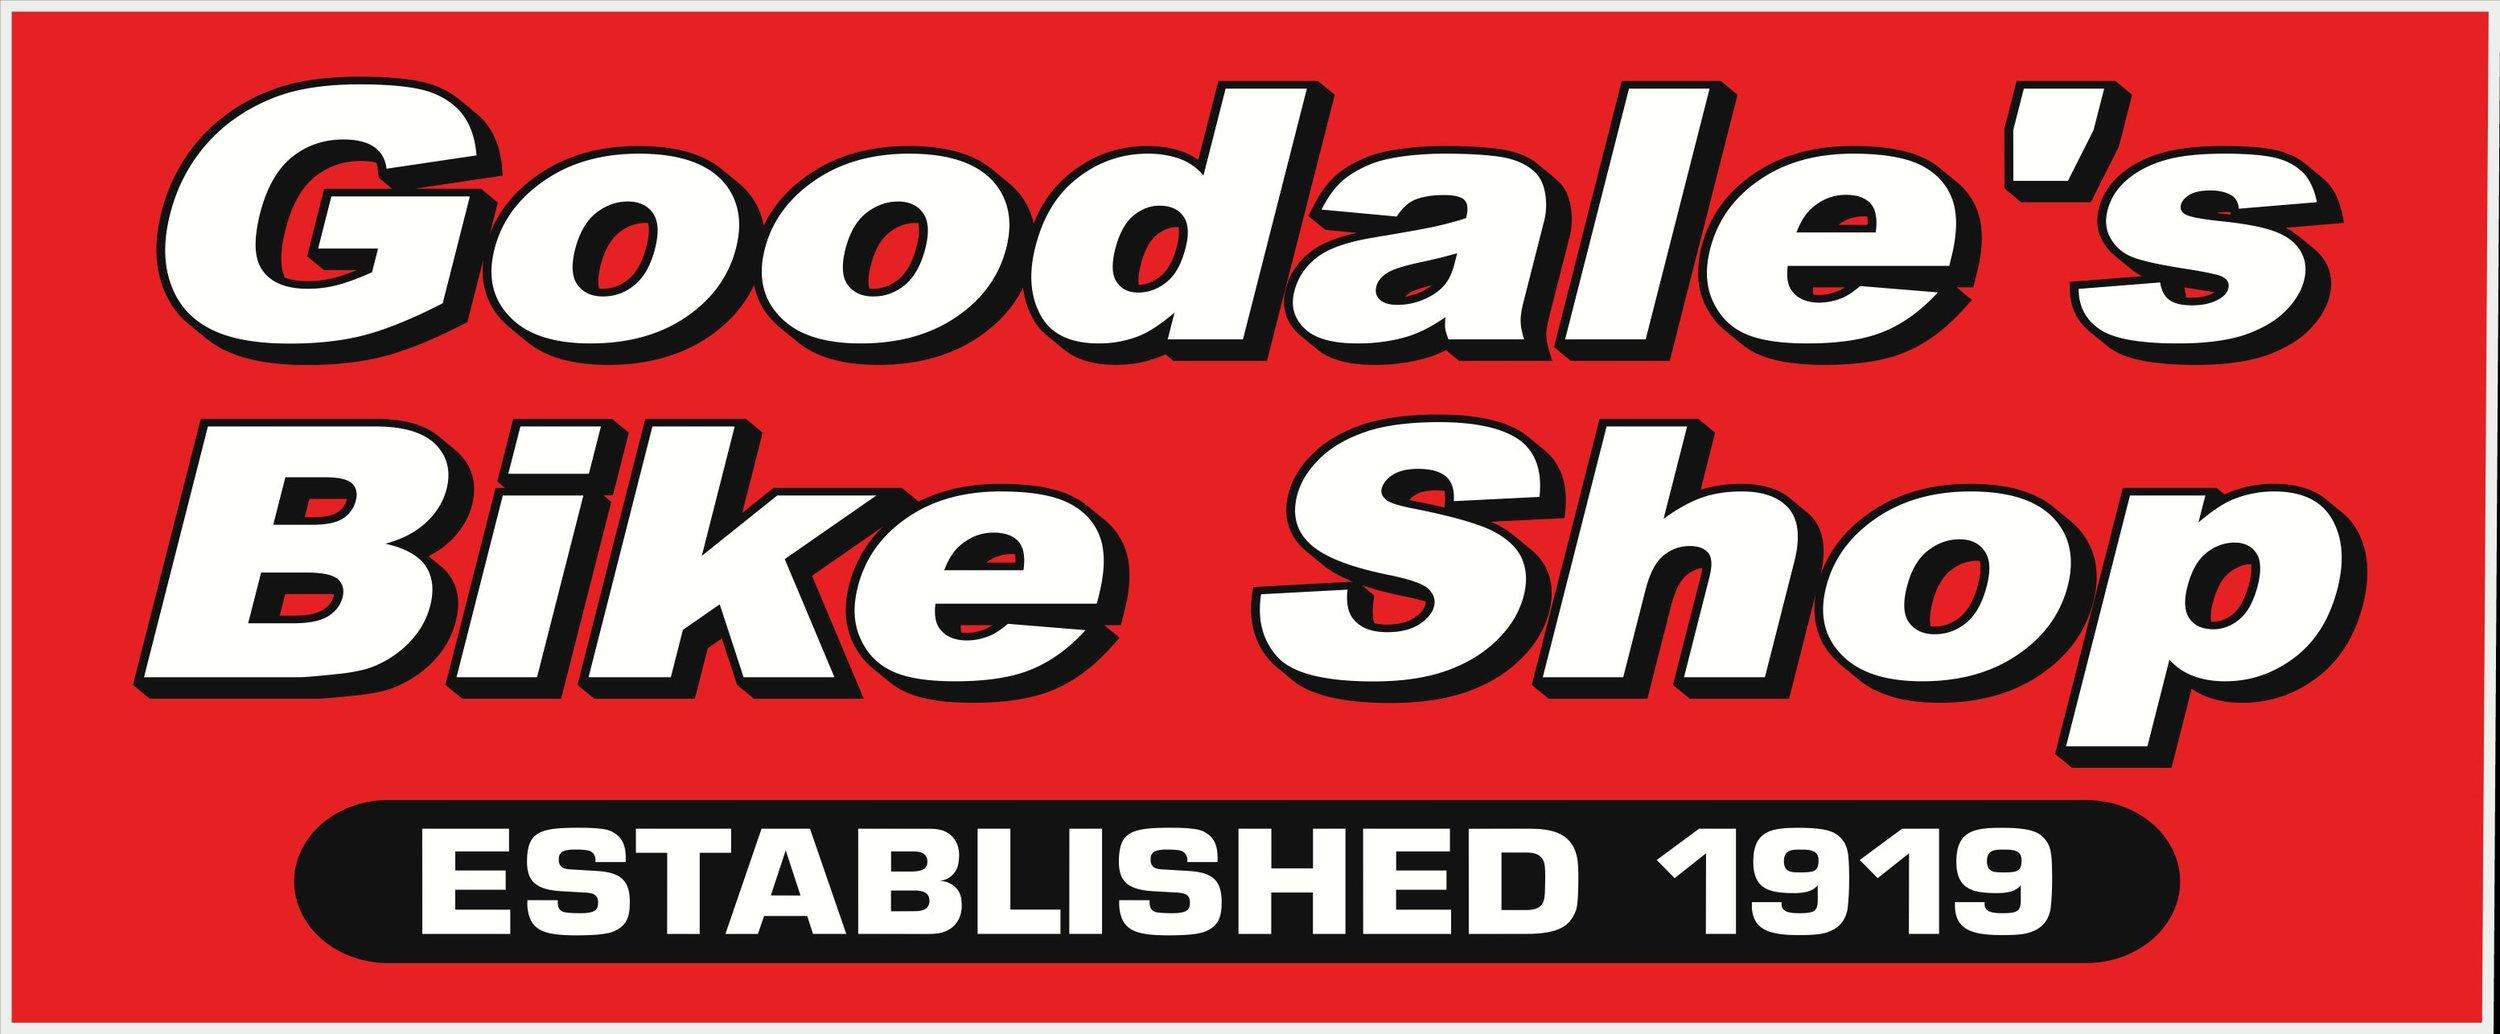 Goodales-Logo-2019-_2.jpg